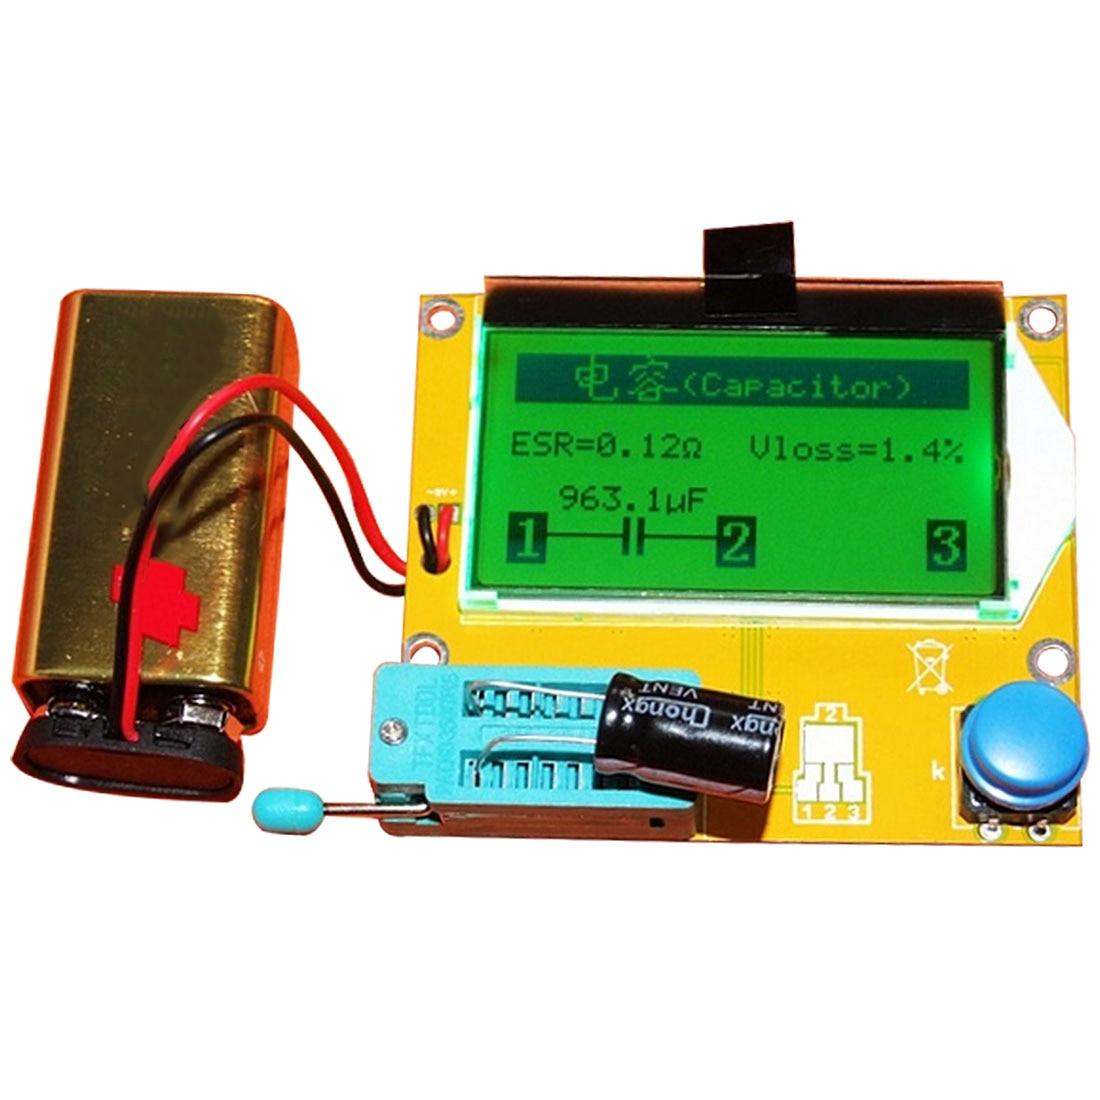 1pcs  ESR T4M328 Digital Transistor Tester Diode Triode Capacitance ESR Meter  For MOS/PNP/NPN LCR 12864 LCD Screen|Multimeters| |  - title=